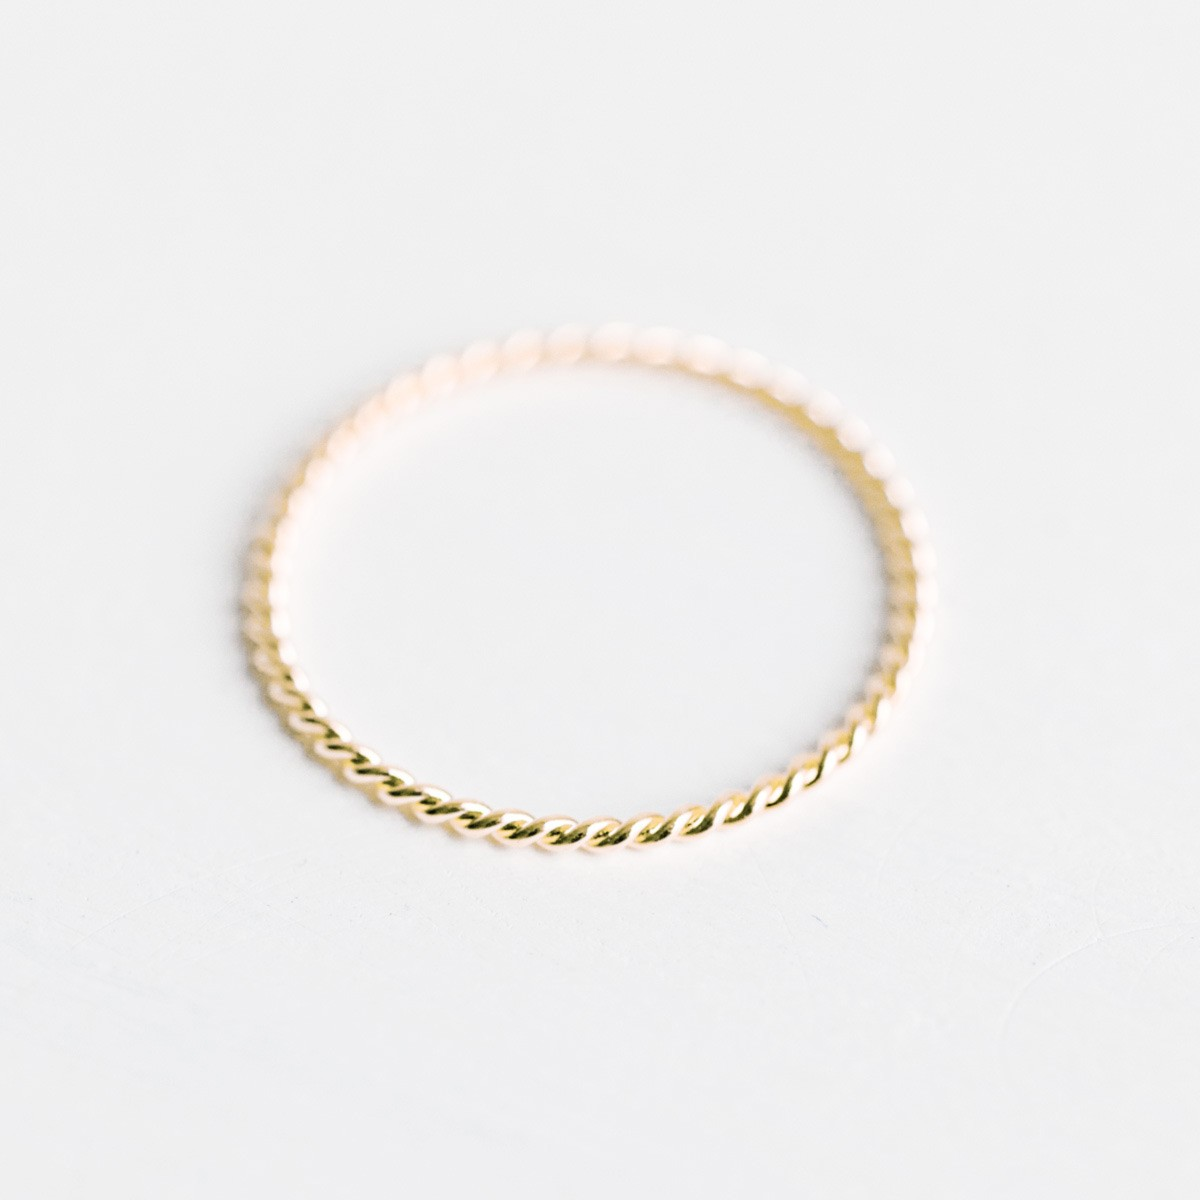 Oh Bracelet Berlin – Ring in Kordel-Optik, vergoldet inkl Box